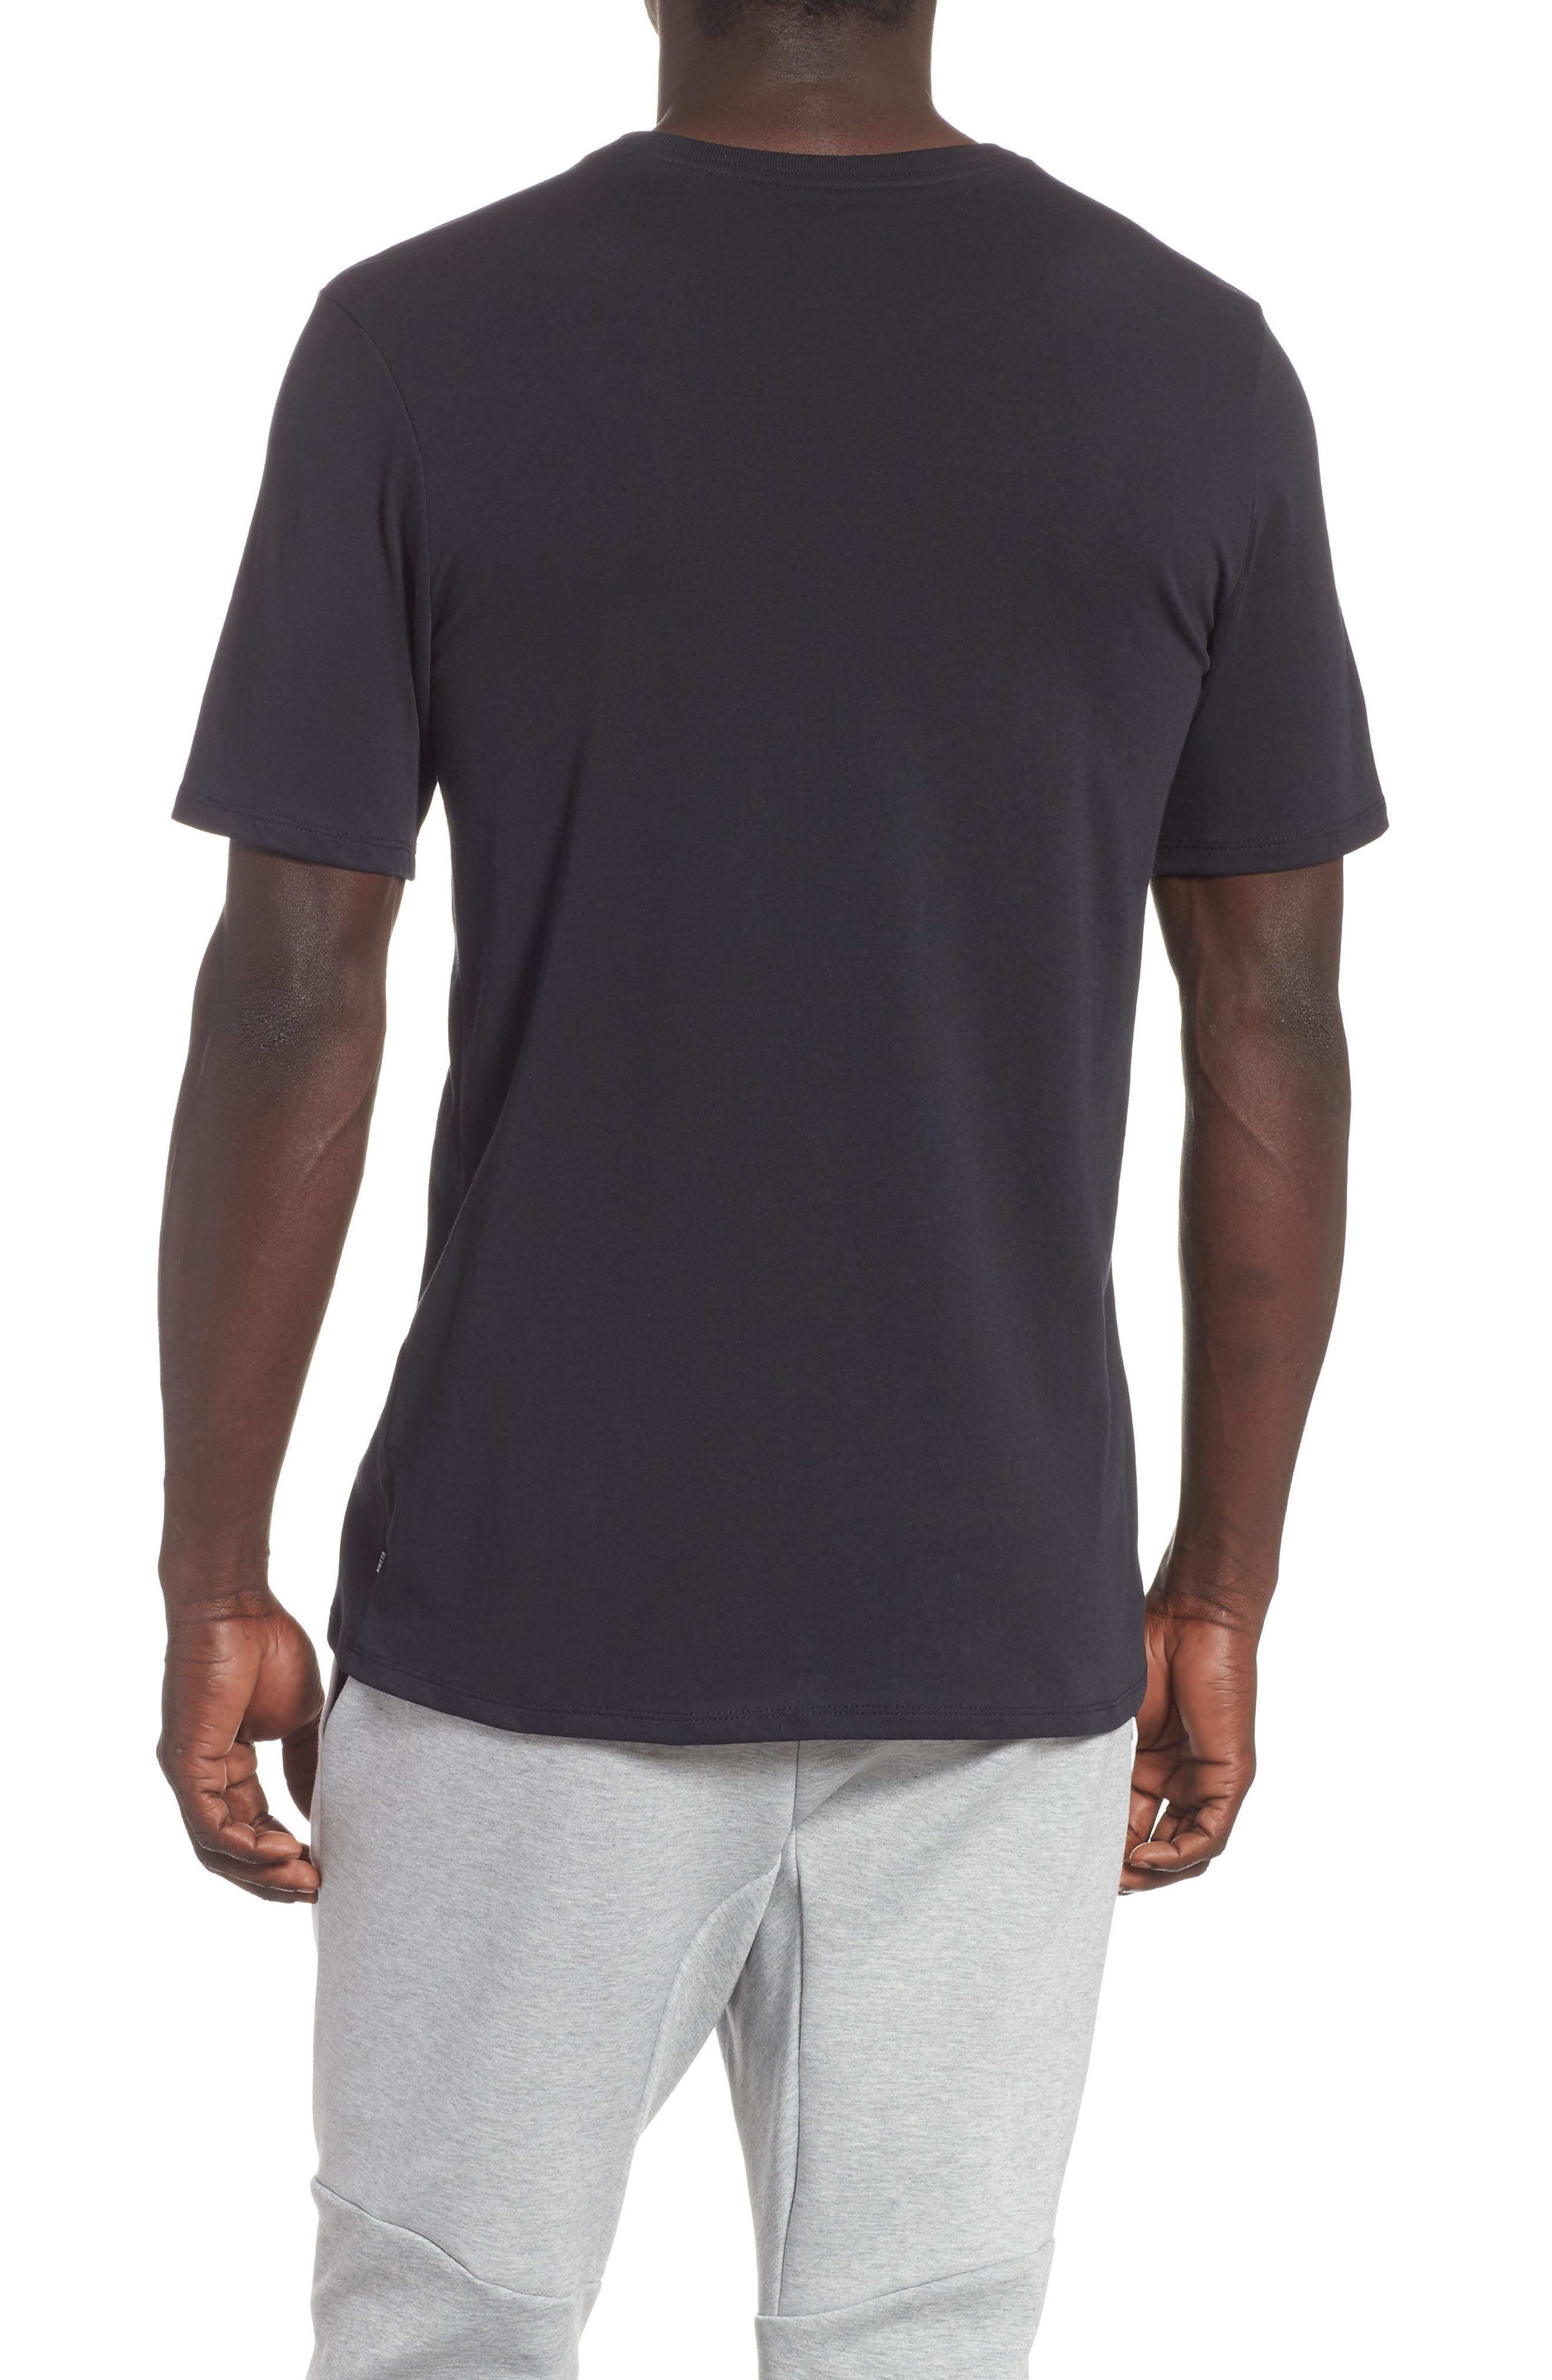 Nike 'SB Logo' T-Shirt,                             Alternate thumbnail 2, color,                             BLACK/ YELLOW/ OCHRE